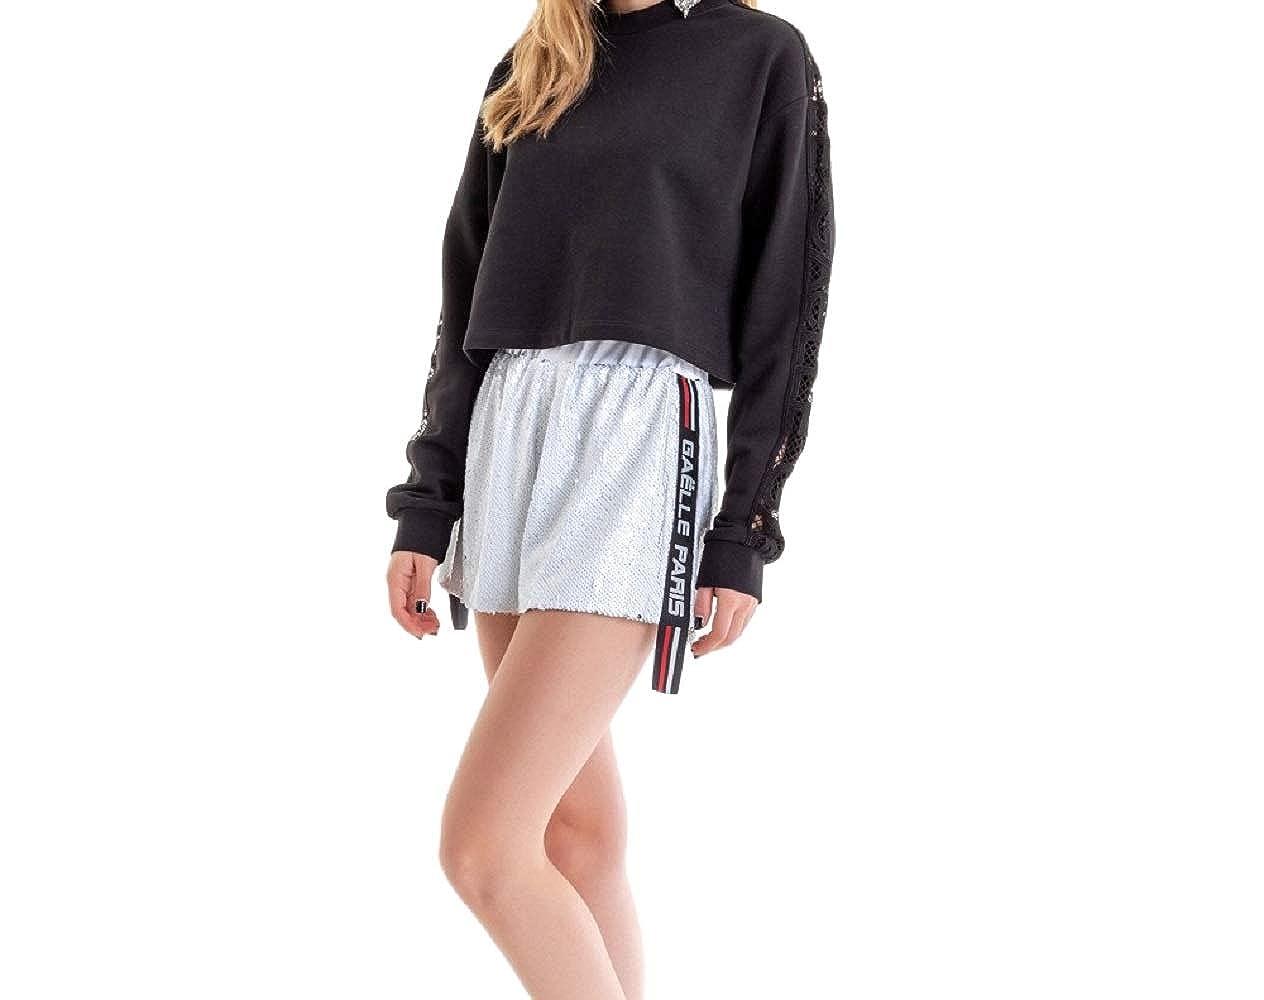 42 - Bianco GAELLE Shorts Donna GBD4324 Bianco Estate 2019 P//E 2019